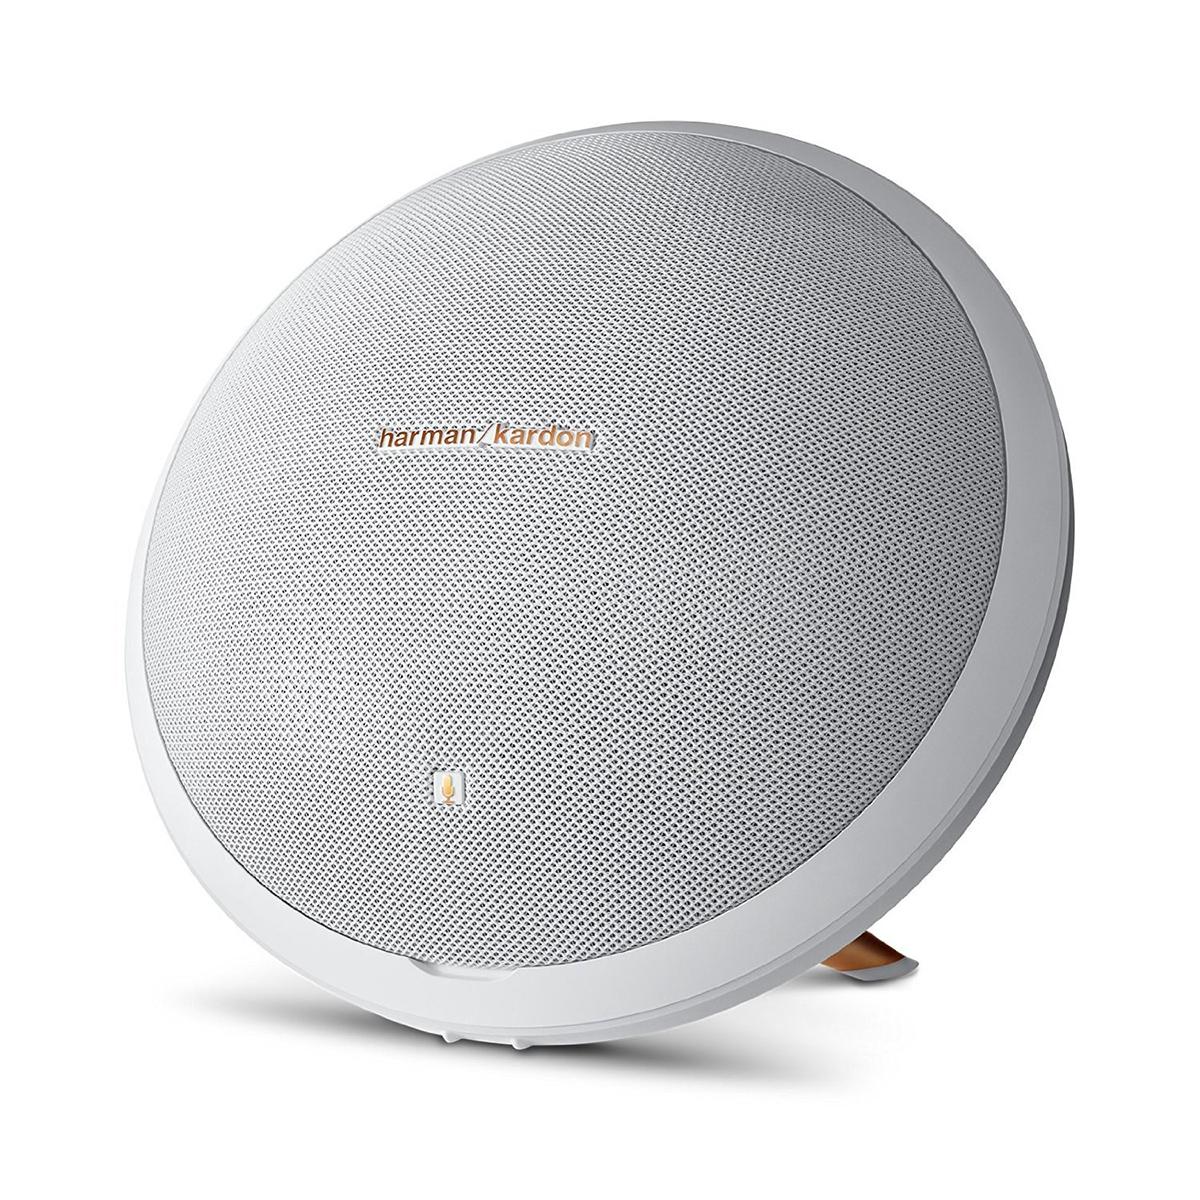 harman kardon onyx studio 2 wireless bluetooth speaker. Black Bedroom Furniture Sets. Home Design Ideas